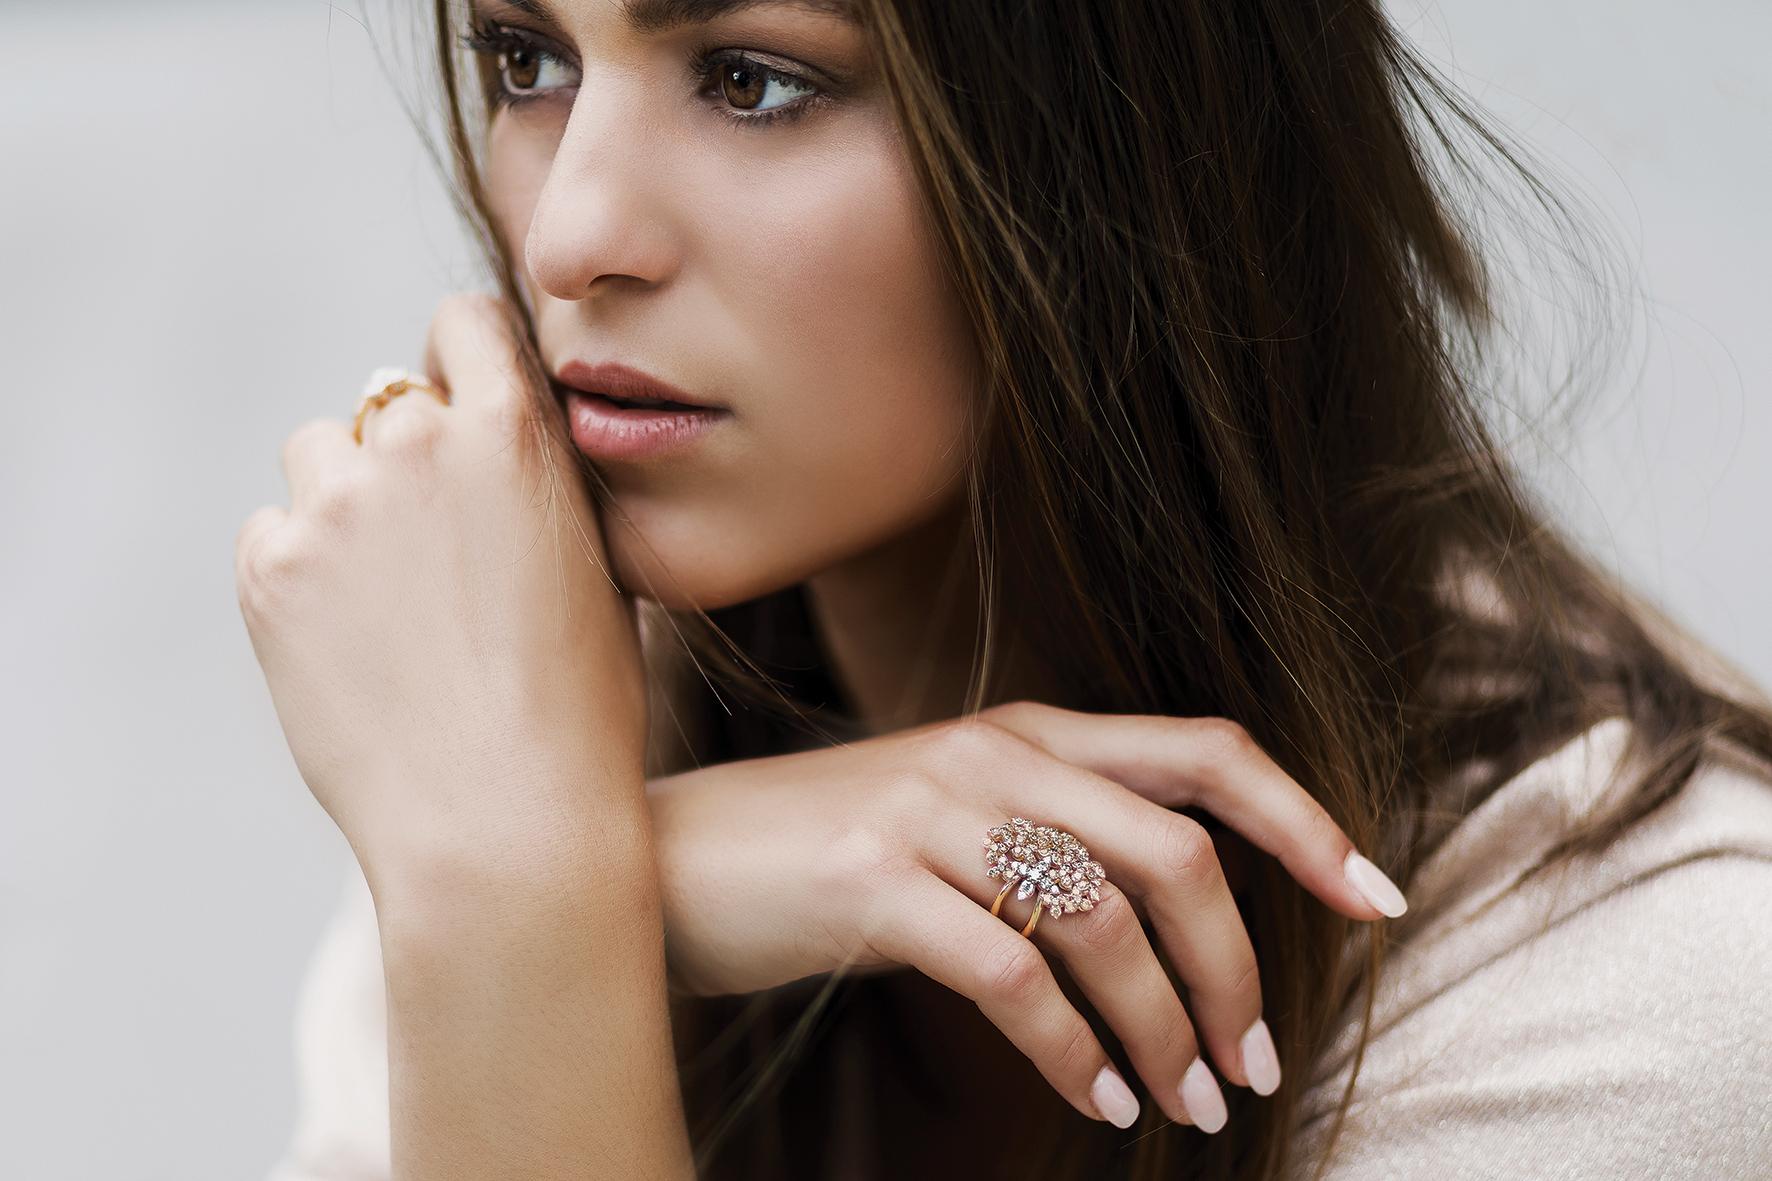 Gio Mio, jewellery, jewelry, ring, diamond, gio mio gioielli, gio mio jewelry